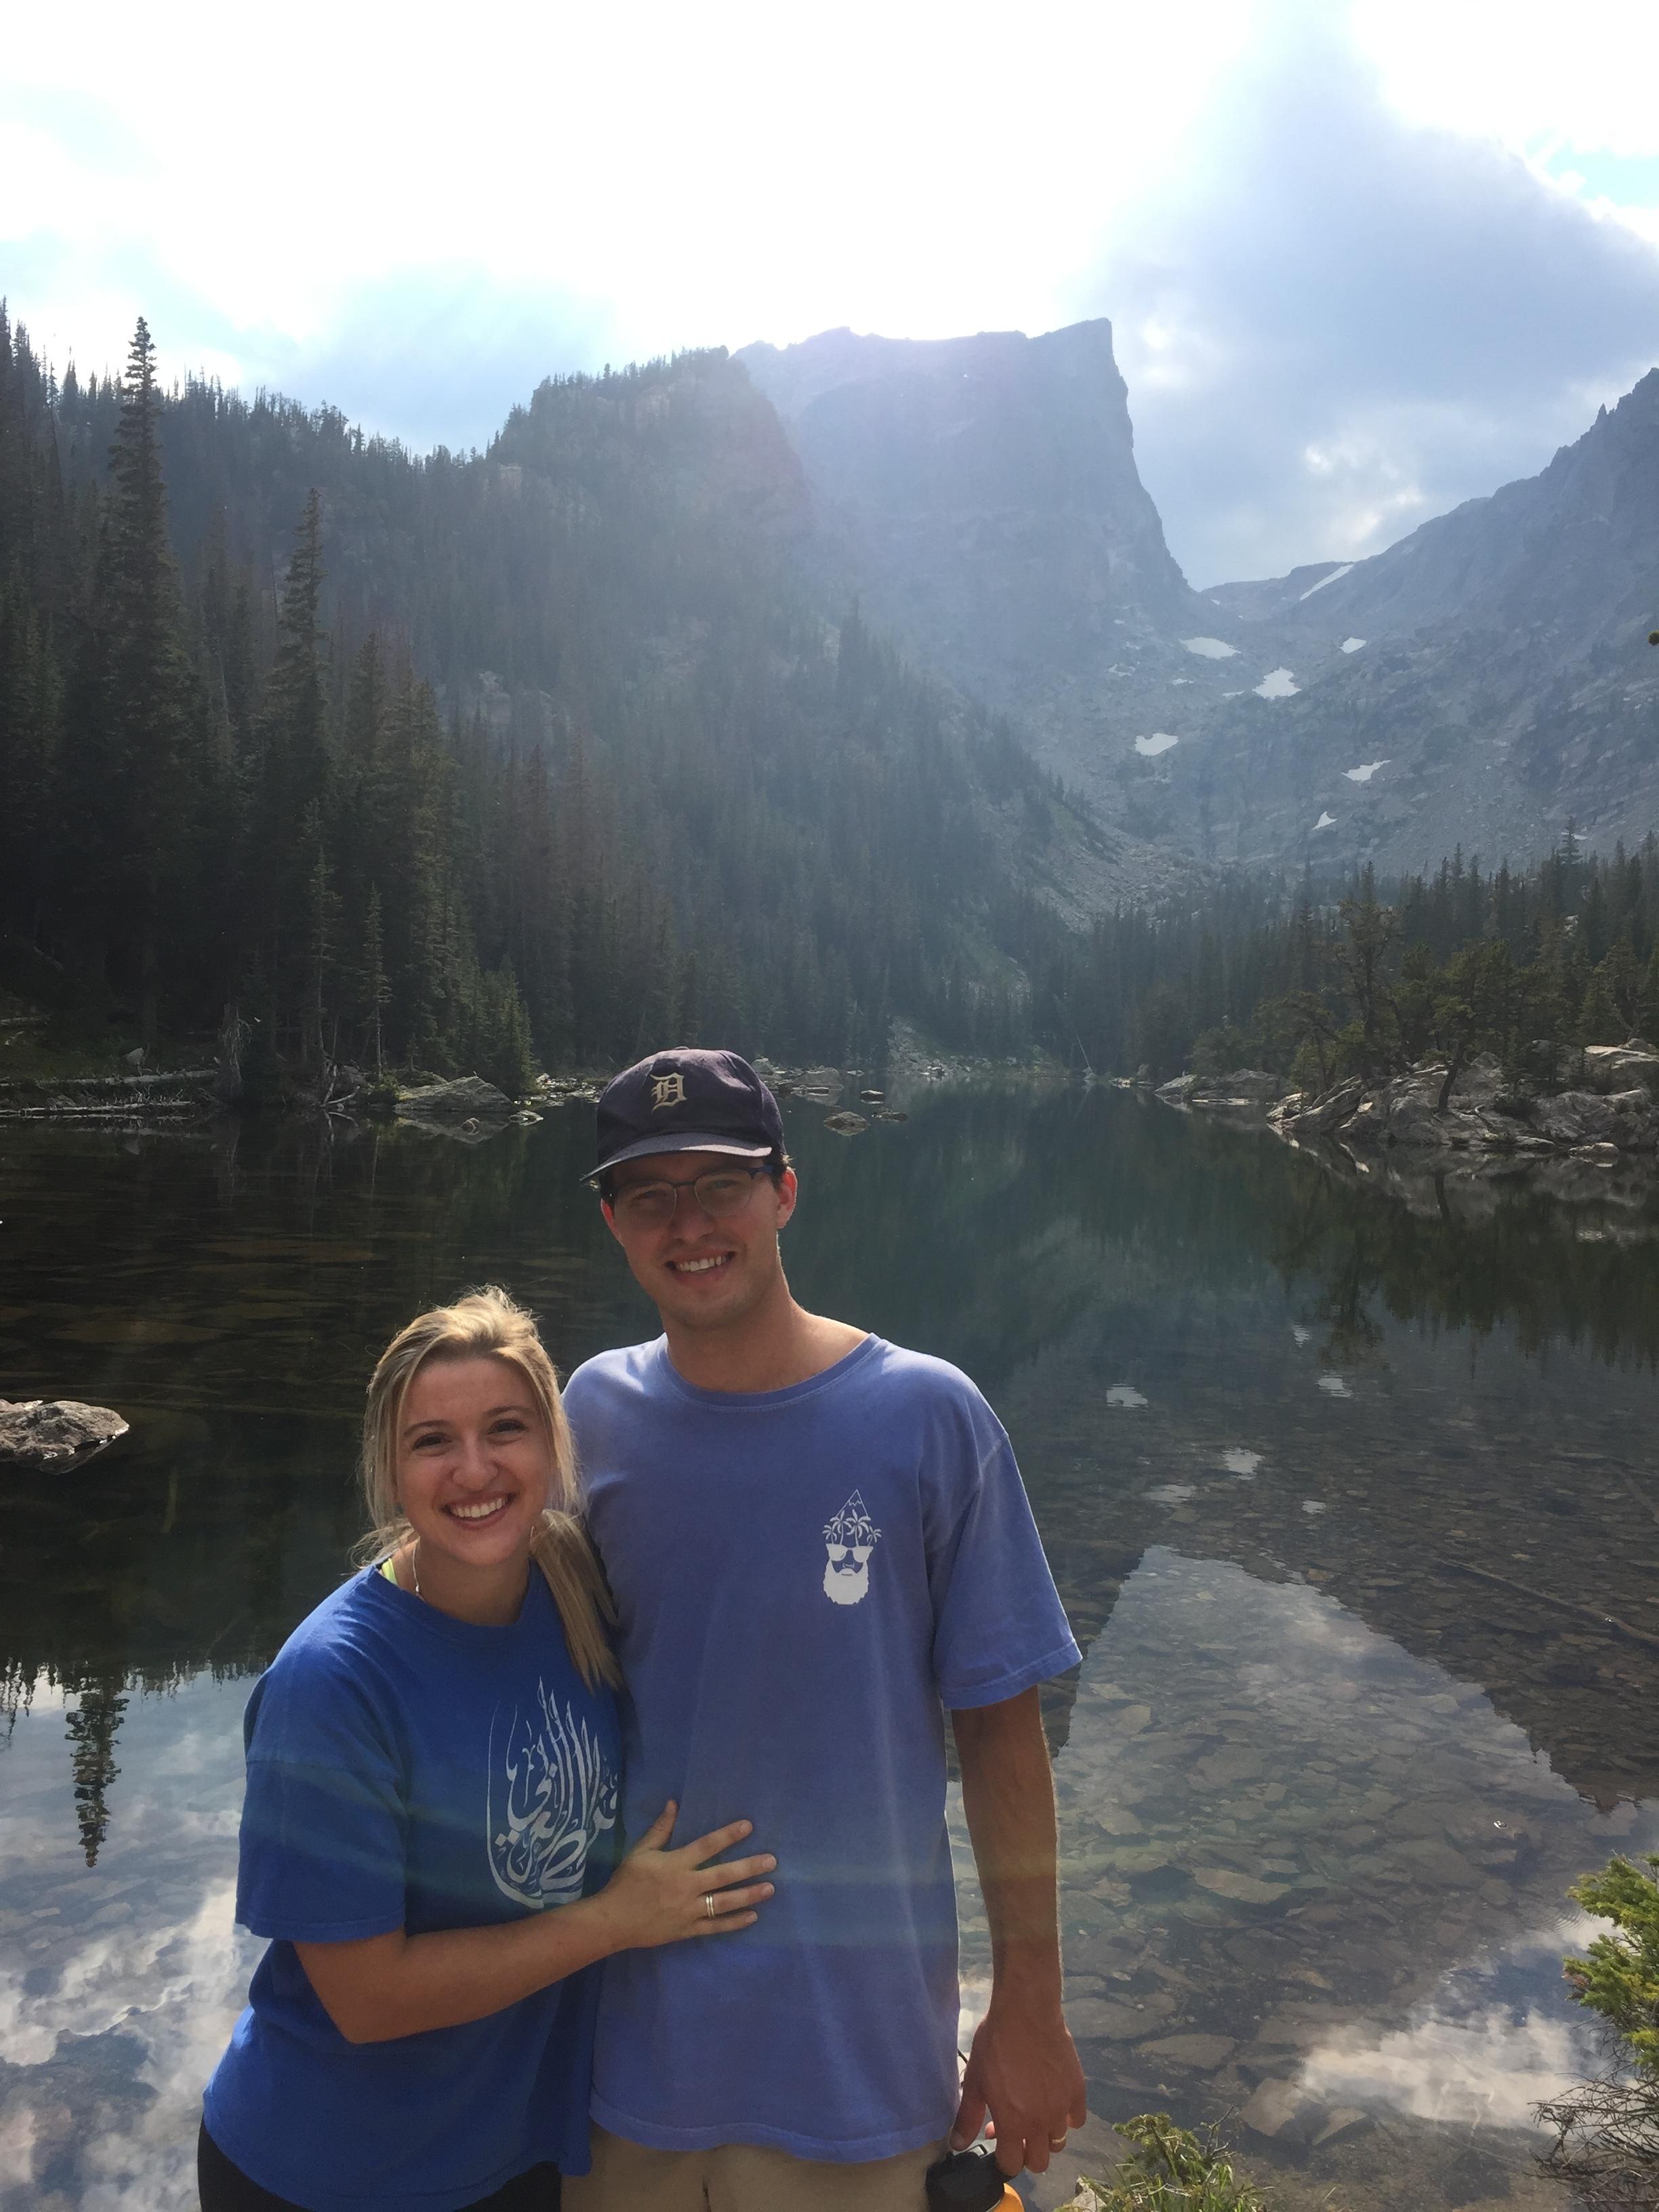 Tara and Kellen hiking in Rocky Mountain National Park.